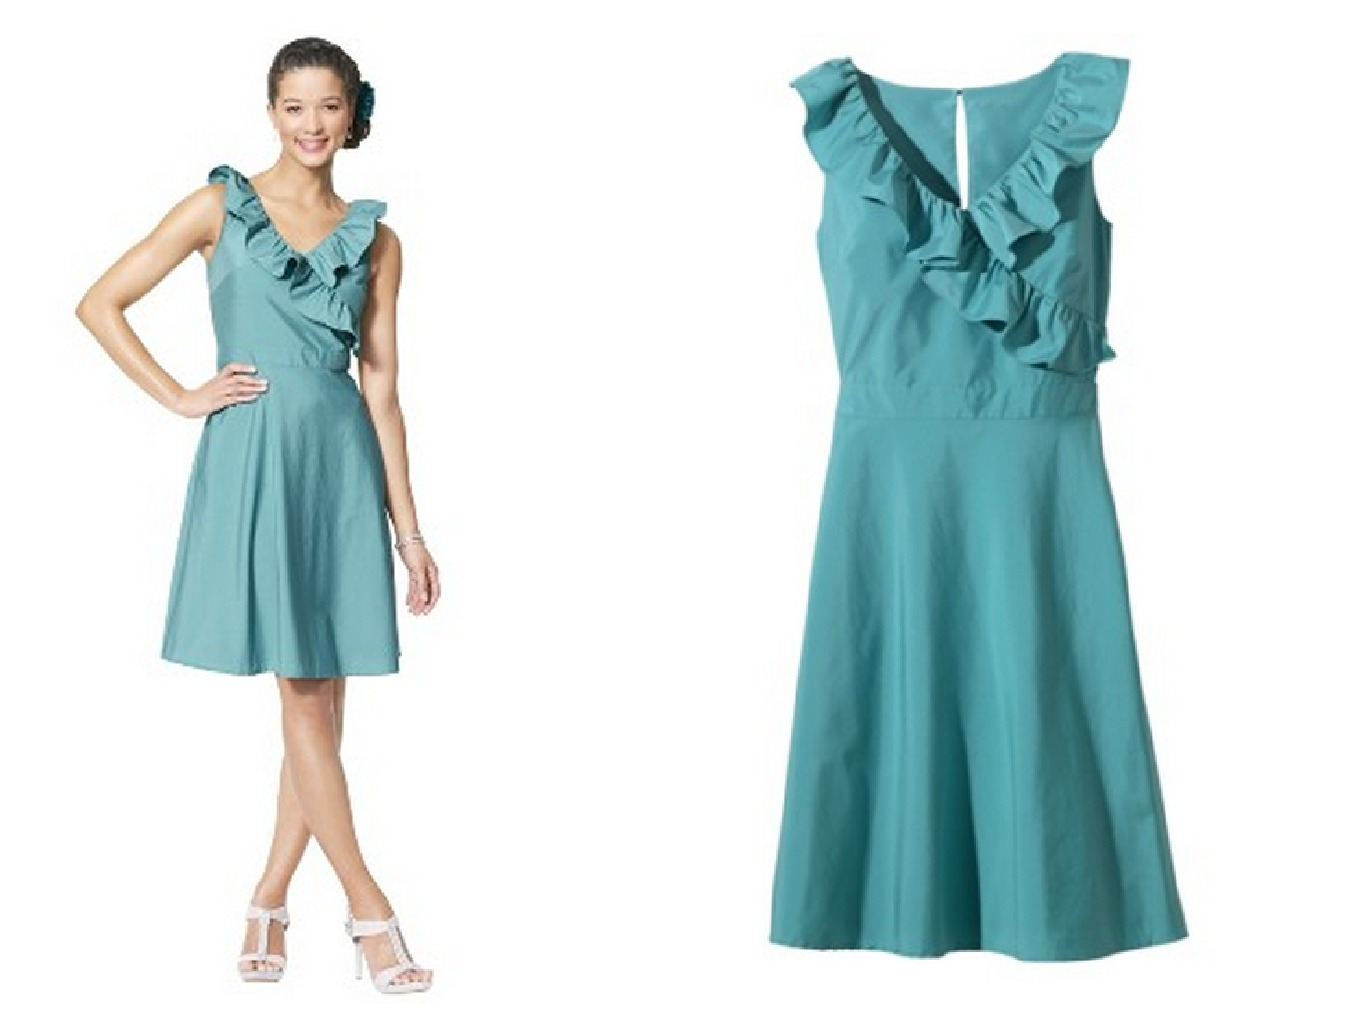 Dorable Target.com Bridesmaid Dresses Component - All Wedding ...